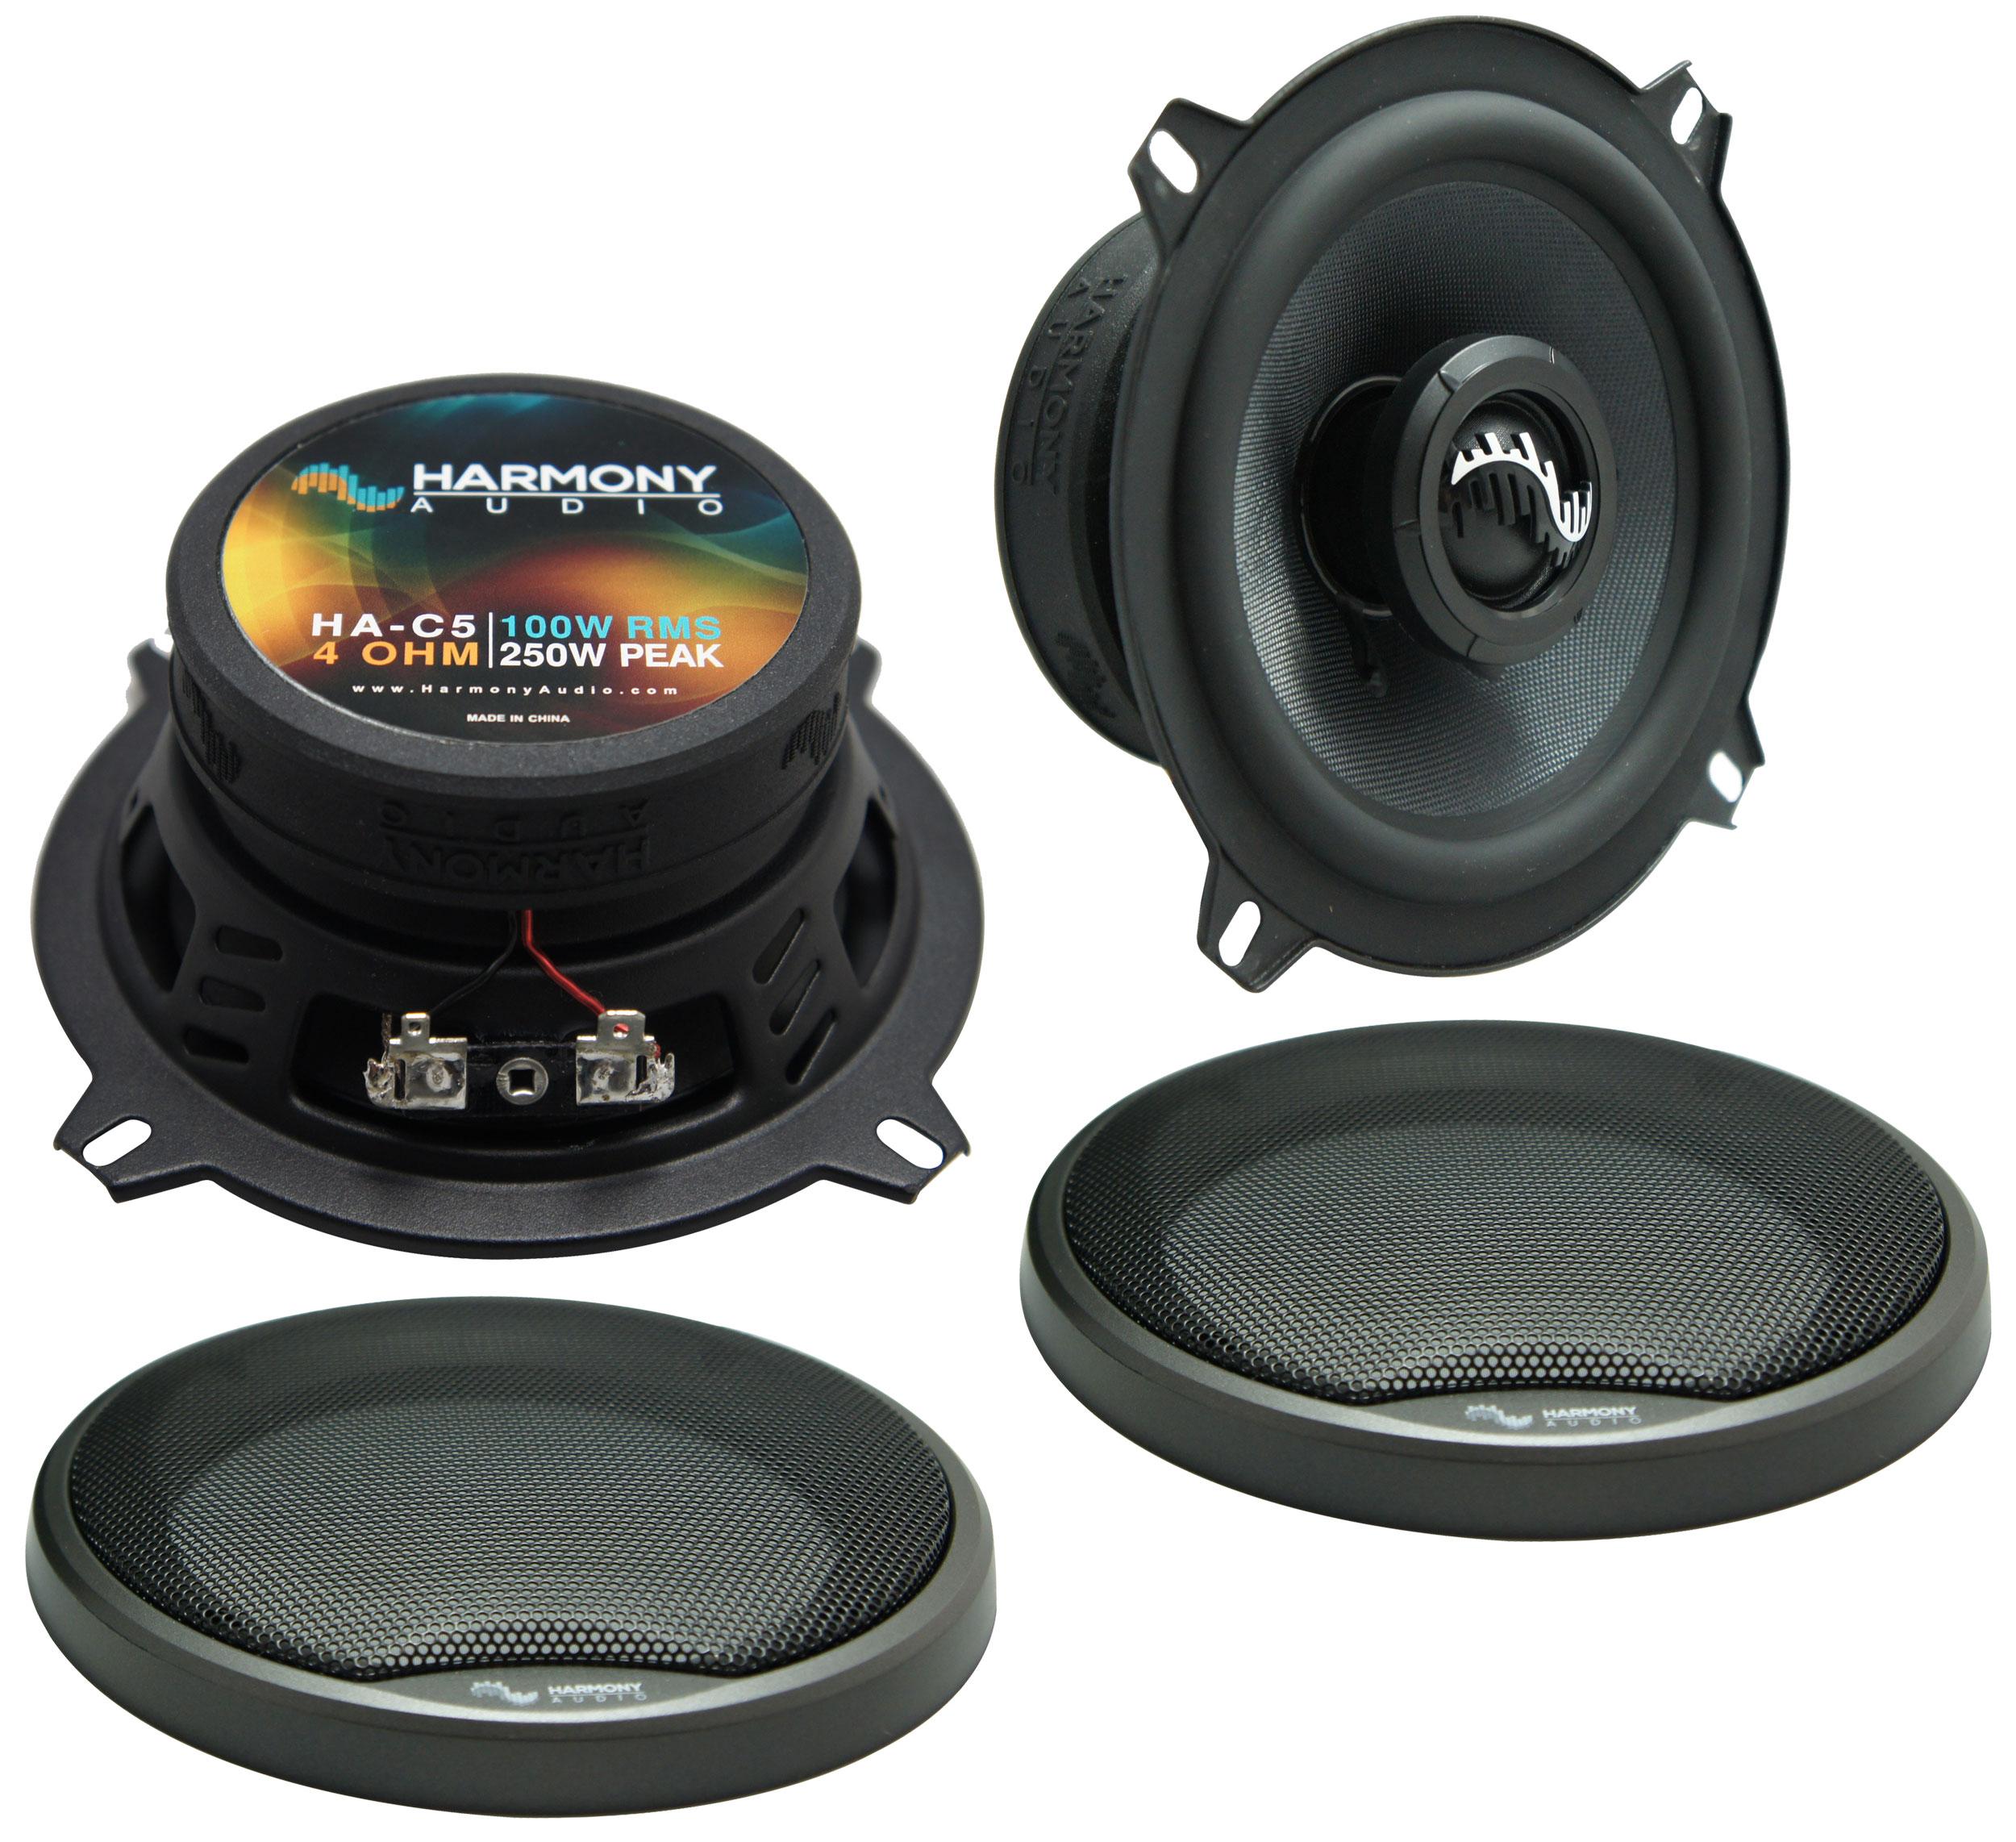 Fits Buick Century 1997-2005 Front Dash Replacement Harmony HA-C5 Premium Speakers New